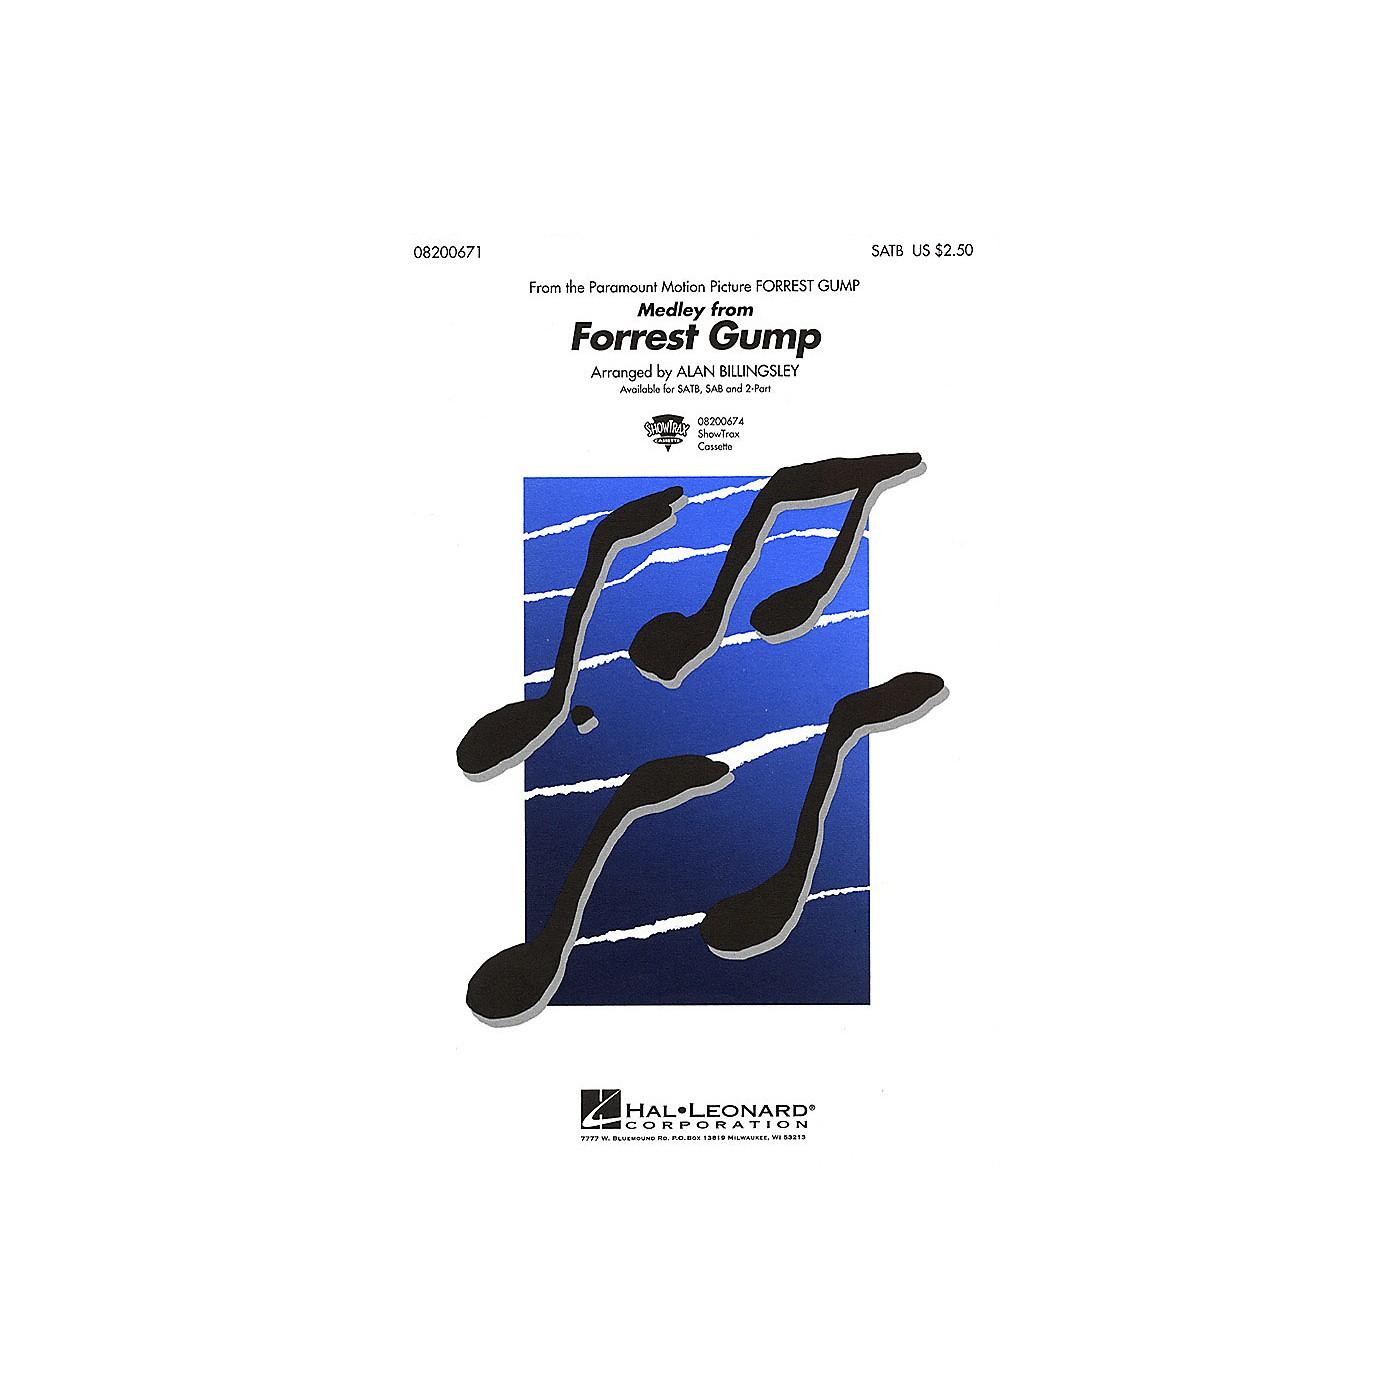 Hal Leonard Forrest Gump (Medley) SATB arranged by Alan Billingsley thumbnail